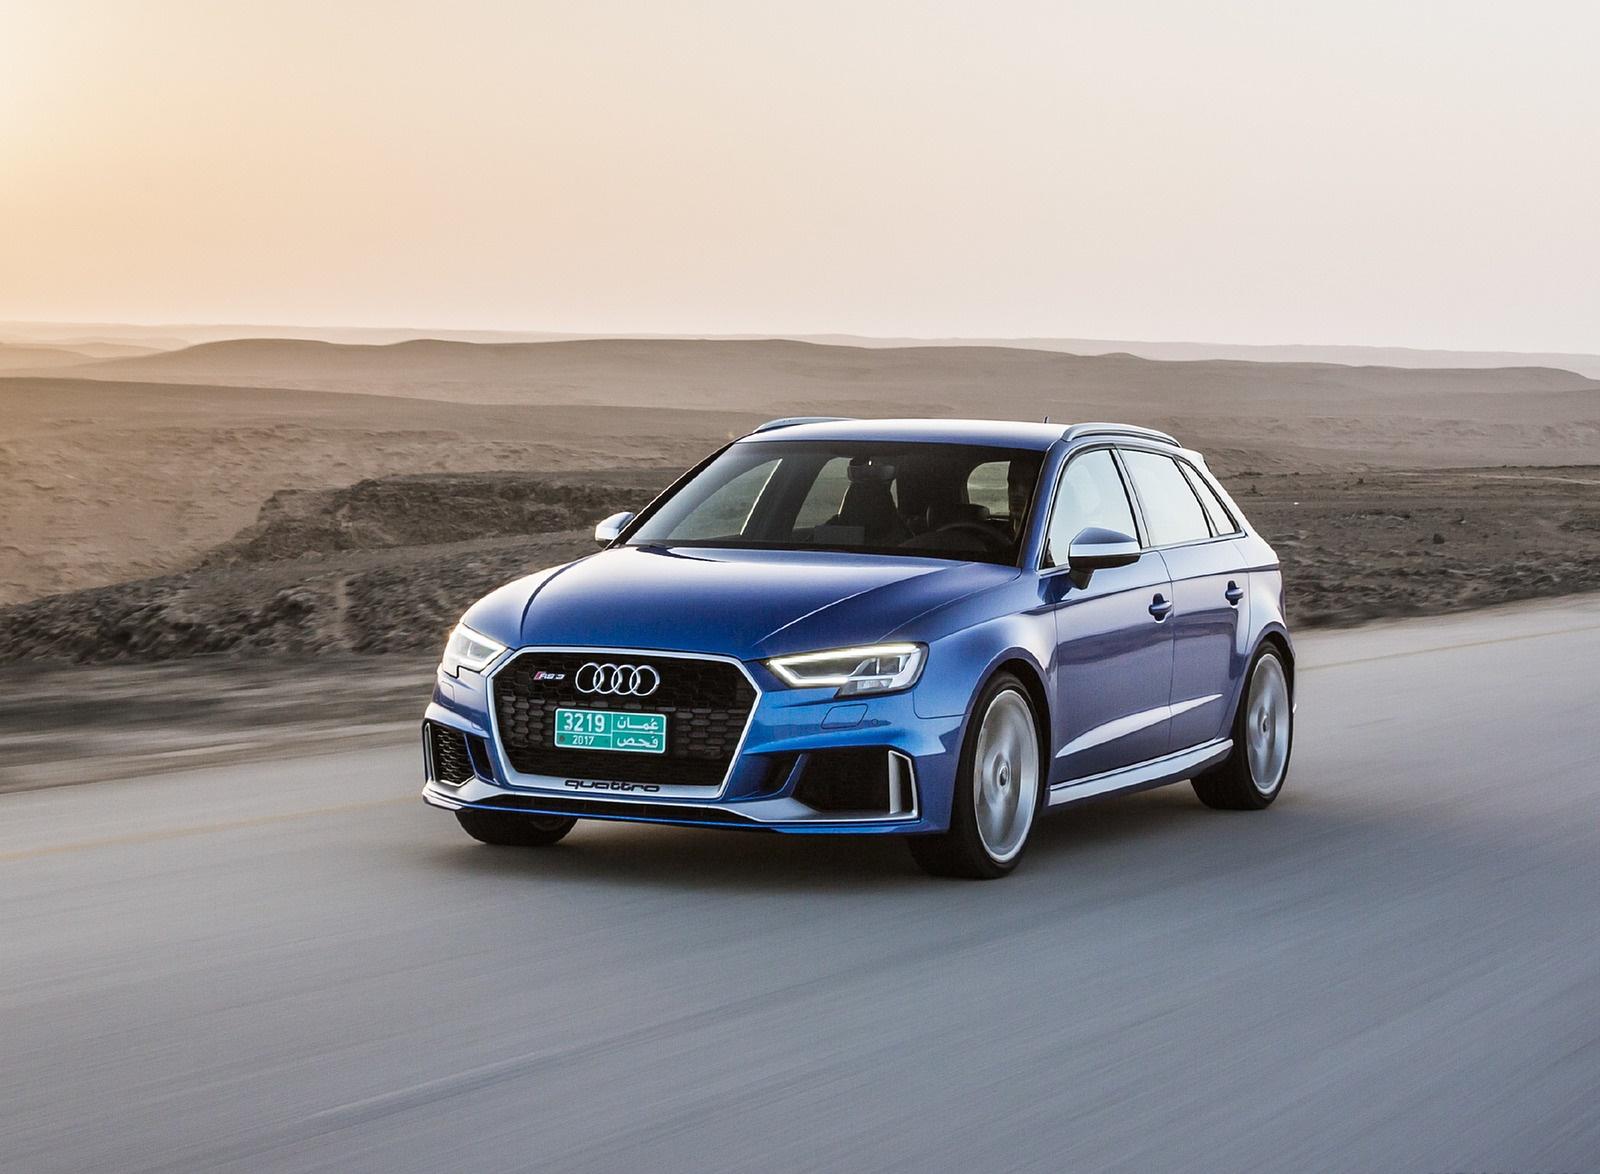 2018 Audi Rs 3 Sportback Color Mystic Blue Front Three Quarter